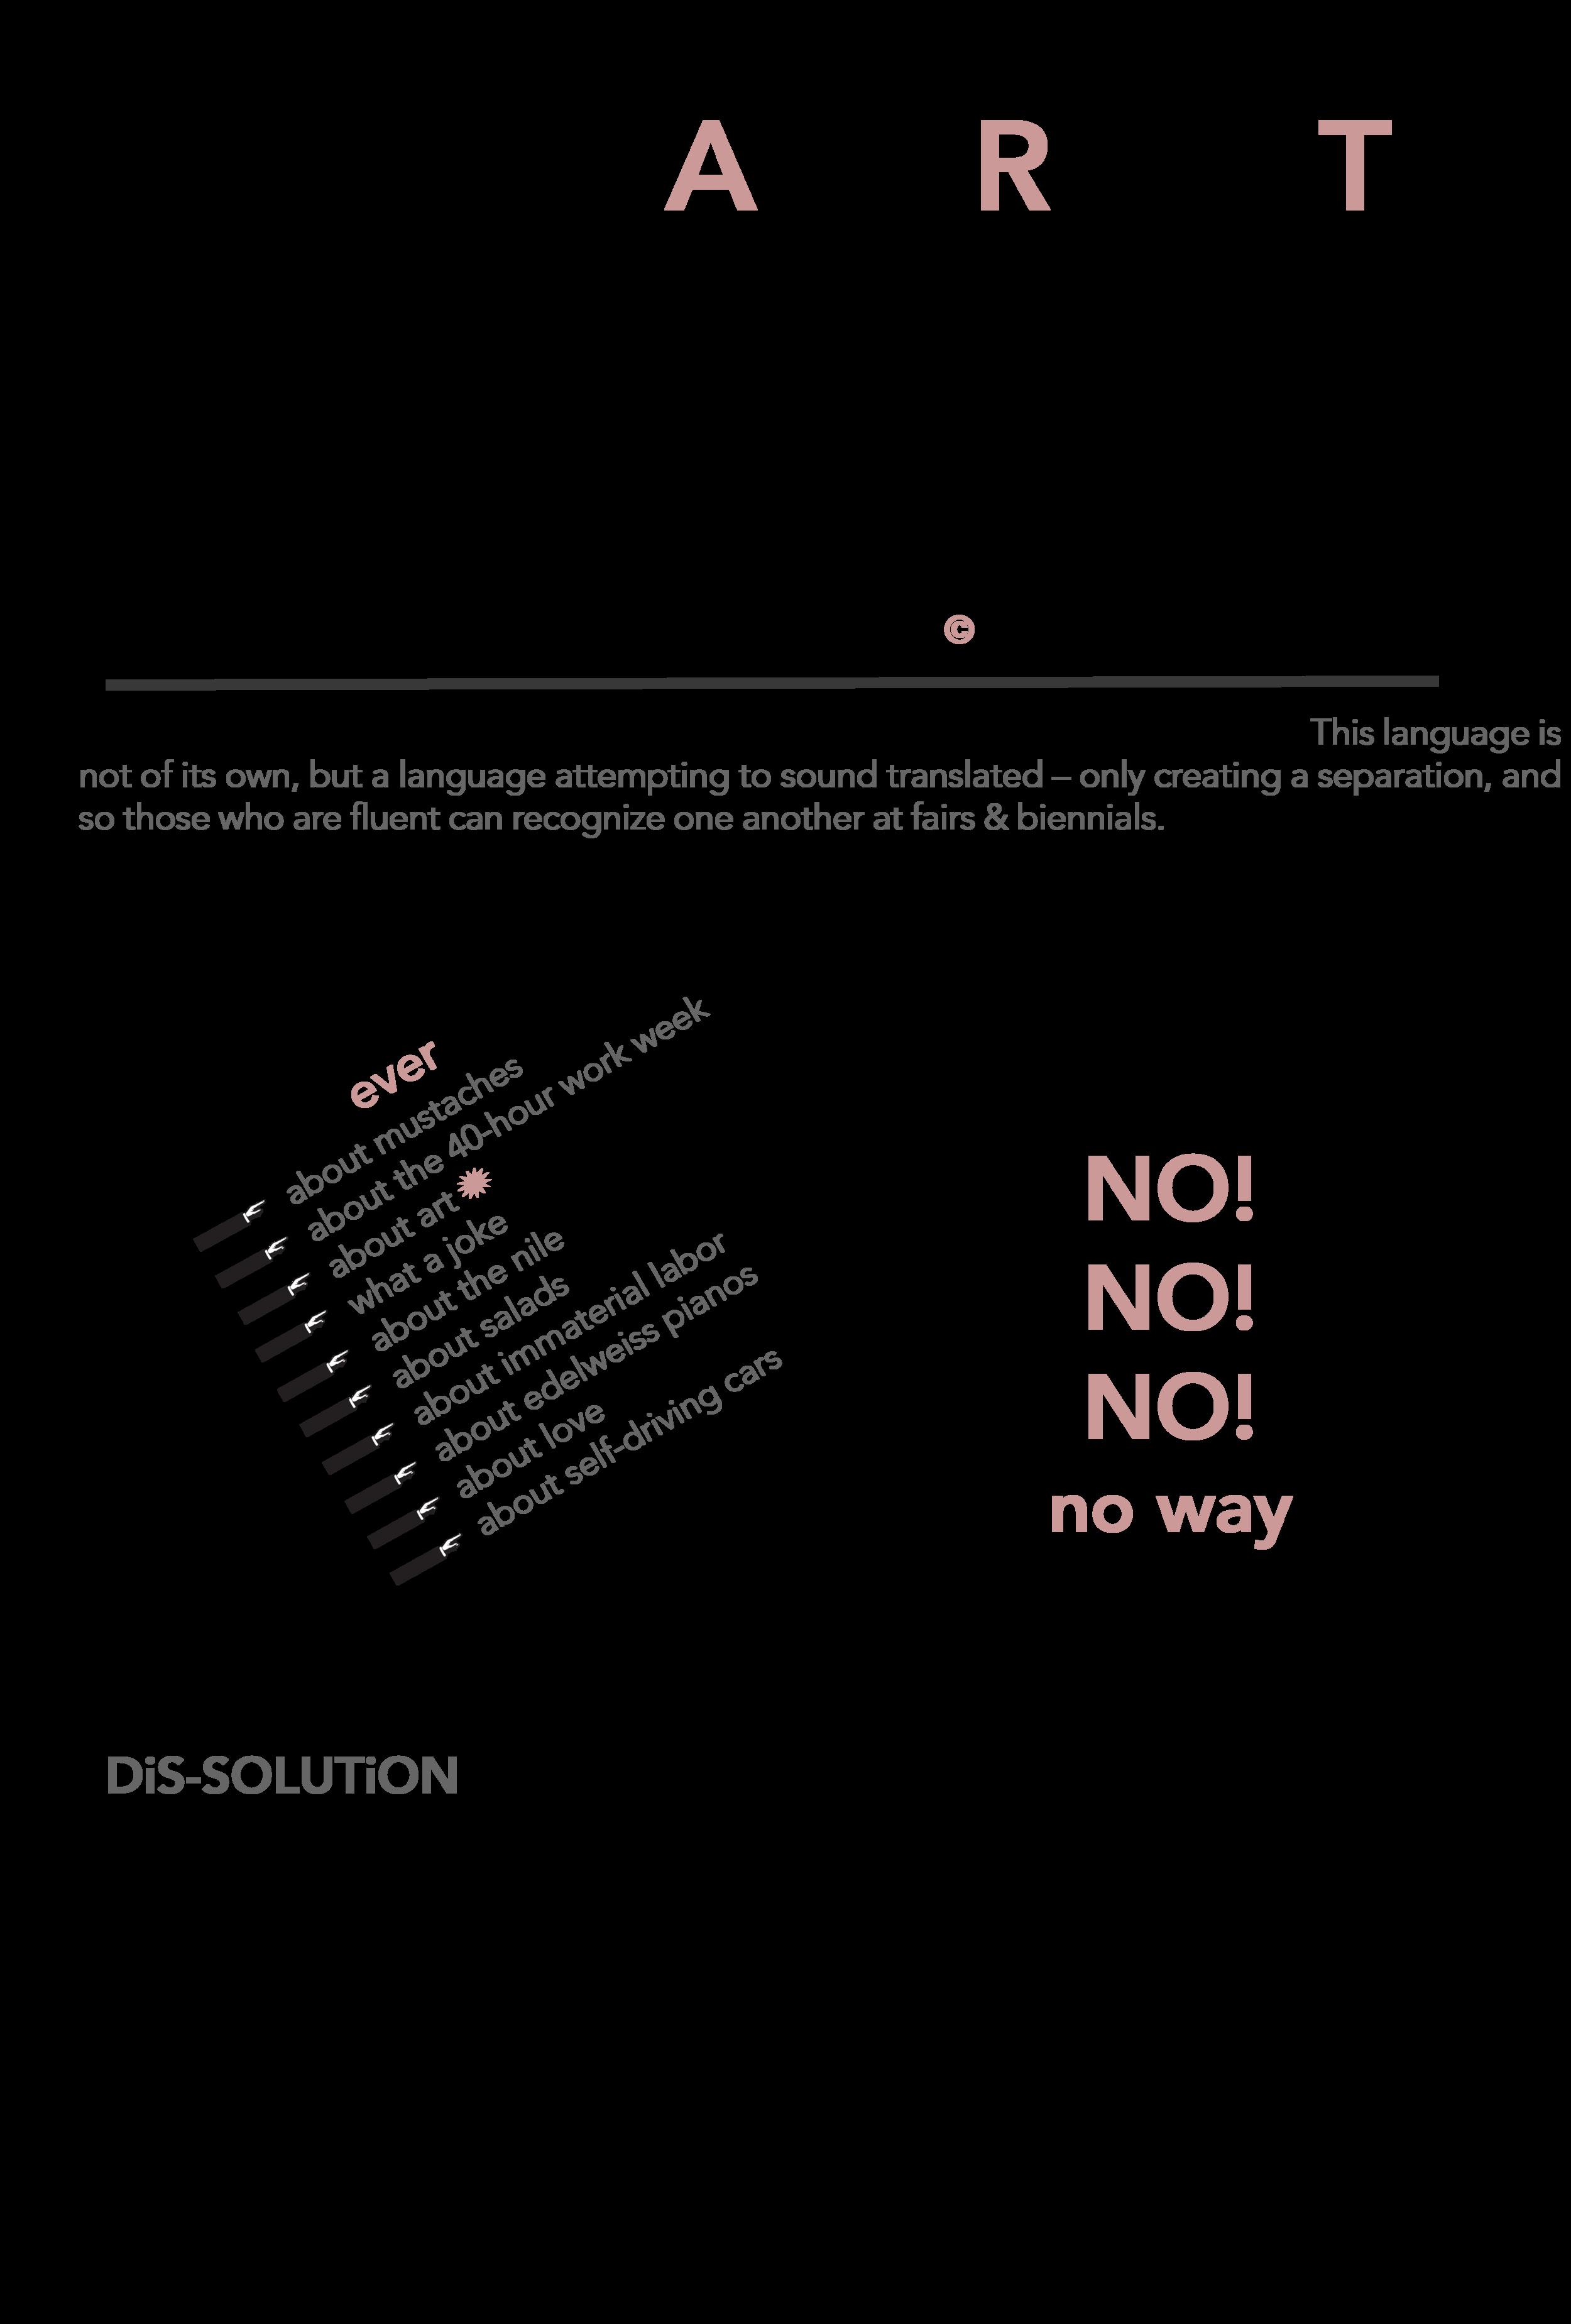 dissolve manifesto600dpi.png